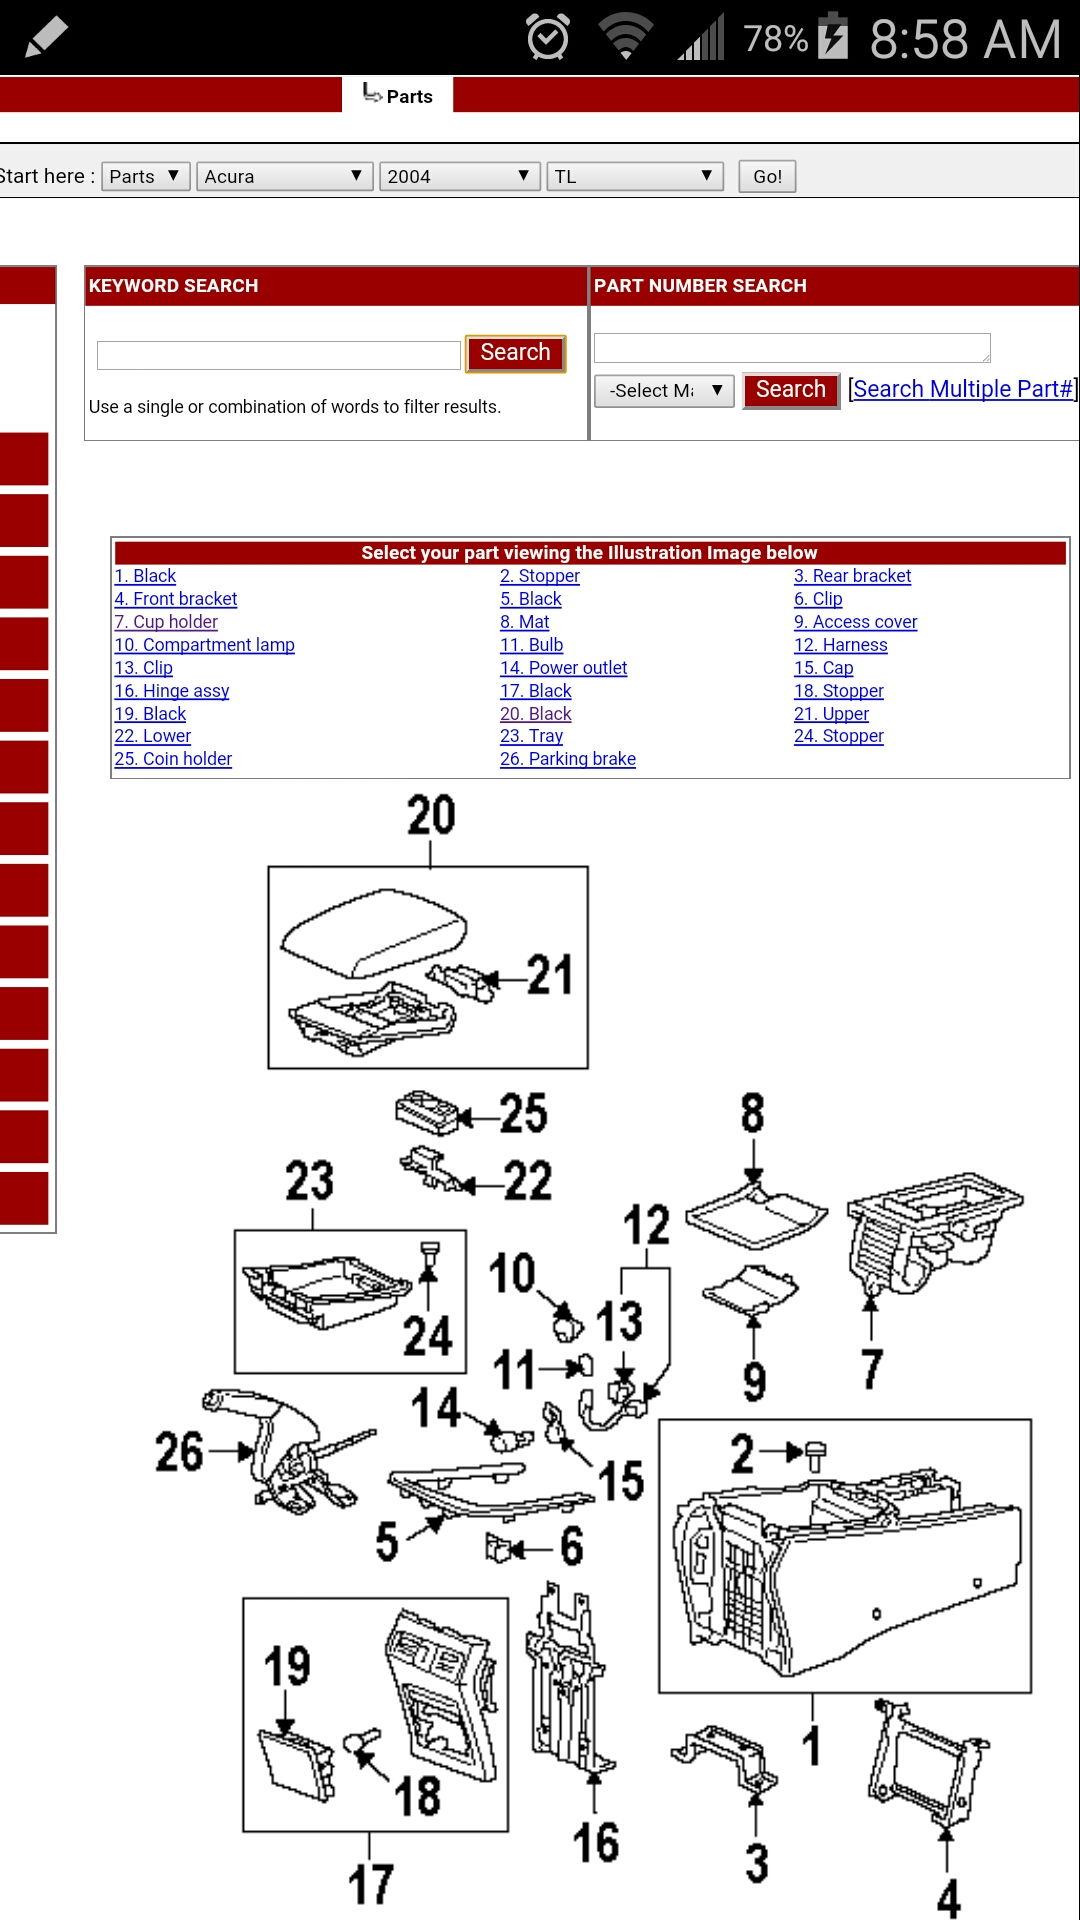 U0026 39 05 Acura Tl Center Console Cup Holder - Acurazine